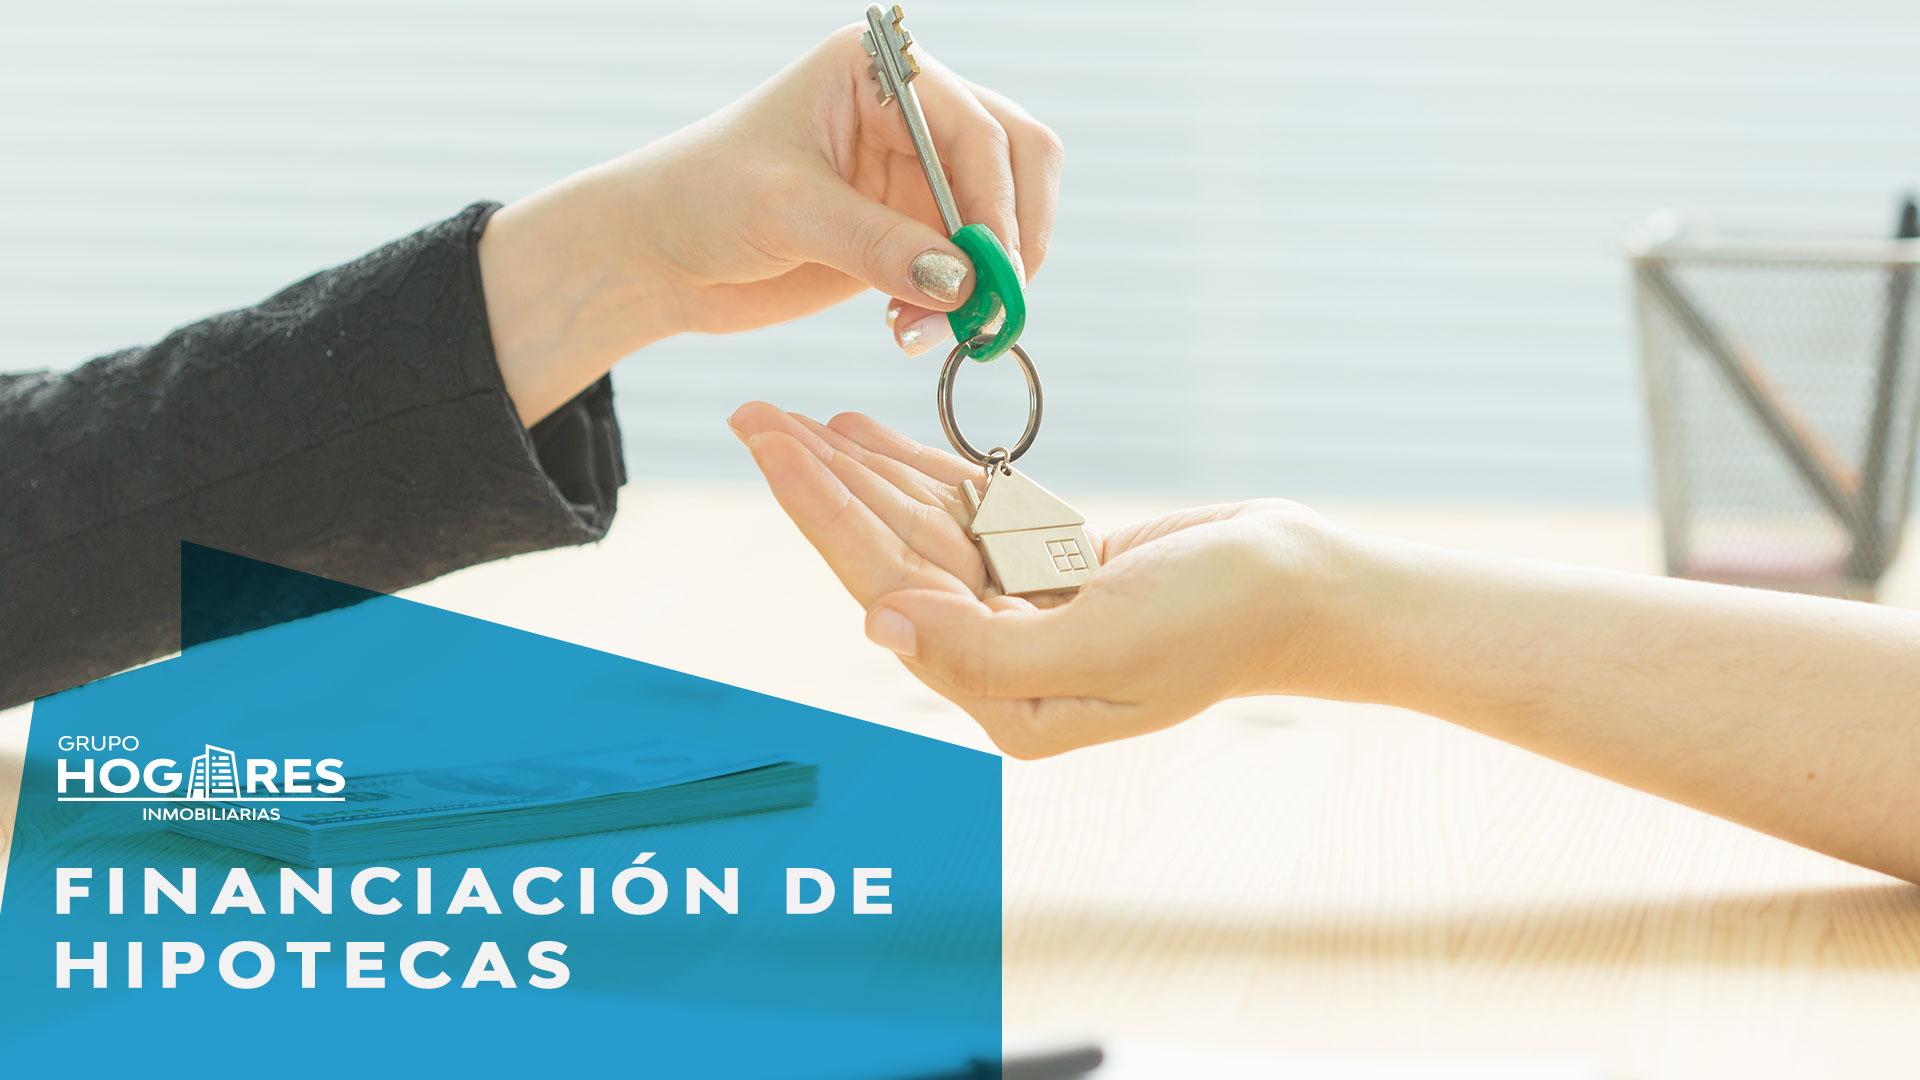 Financiación de hipotecas en Valencia